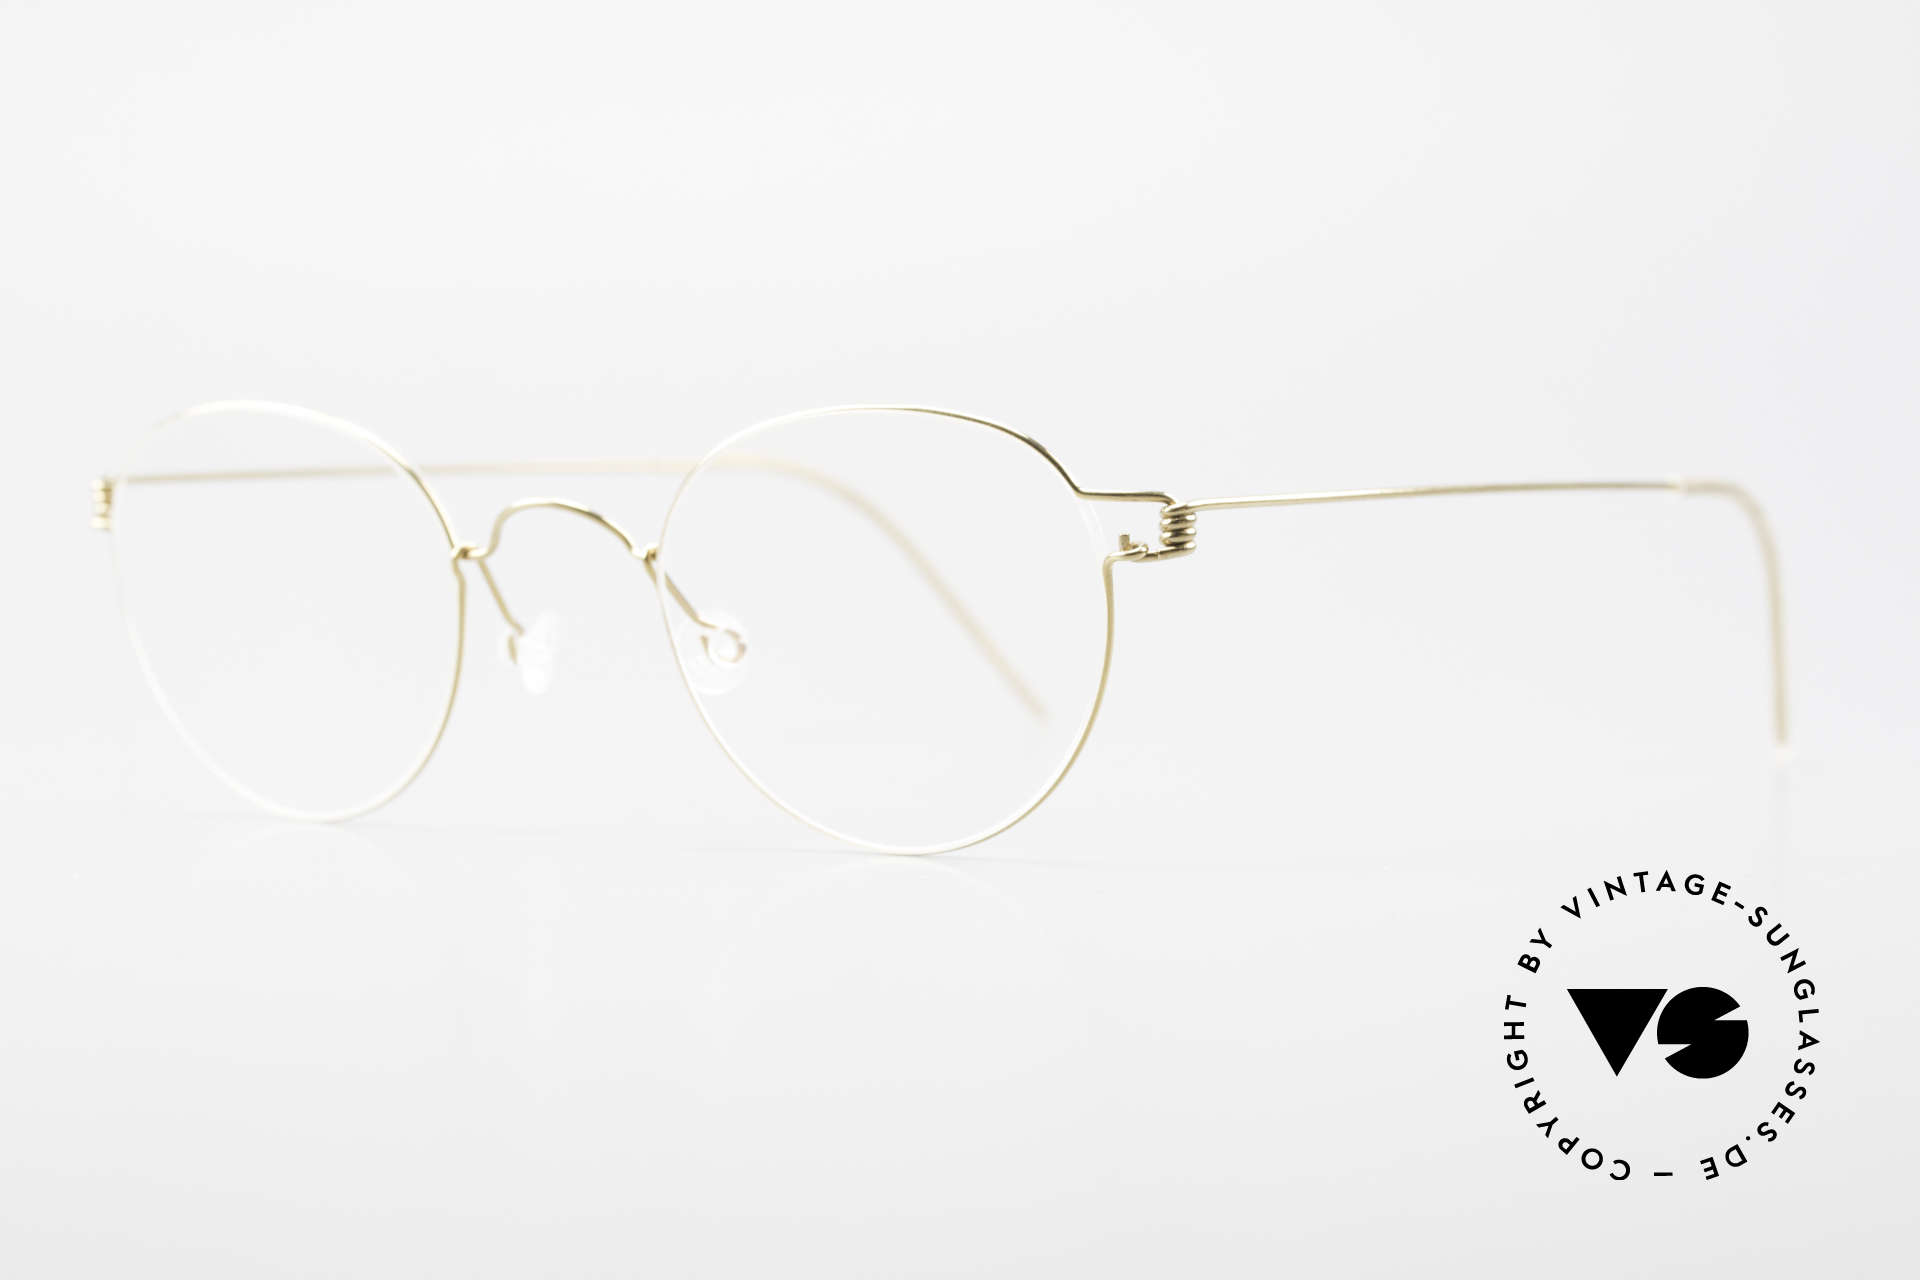 Lindberg Matt Air Titan Rim Panto Titanium Frame Unisex, simply timeless, stylish & innovative: grade 'vintage', Made for Men and Women